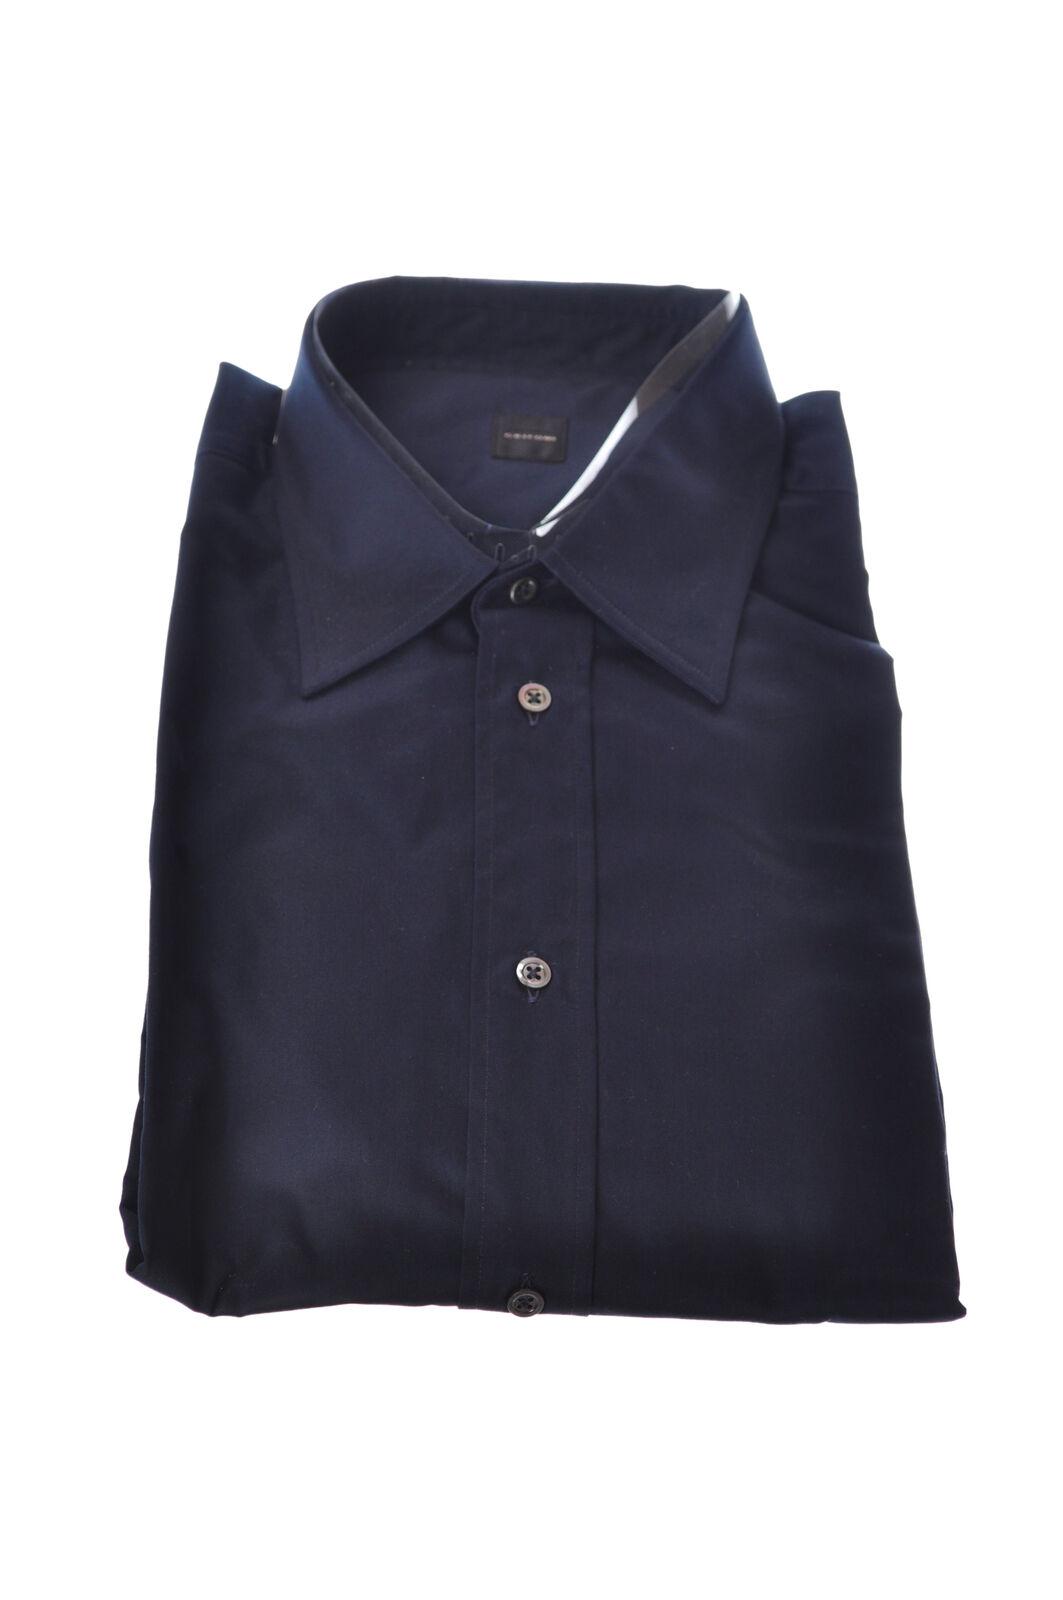 Mauro grifoni  -  Camiseta - Hombre - Azul - 3002205A183723